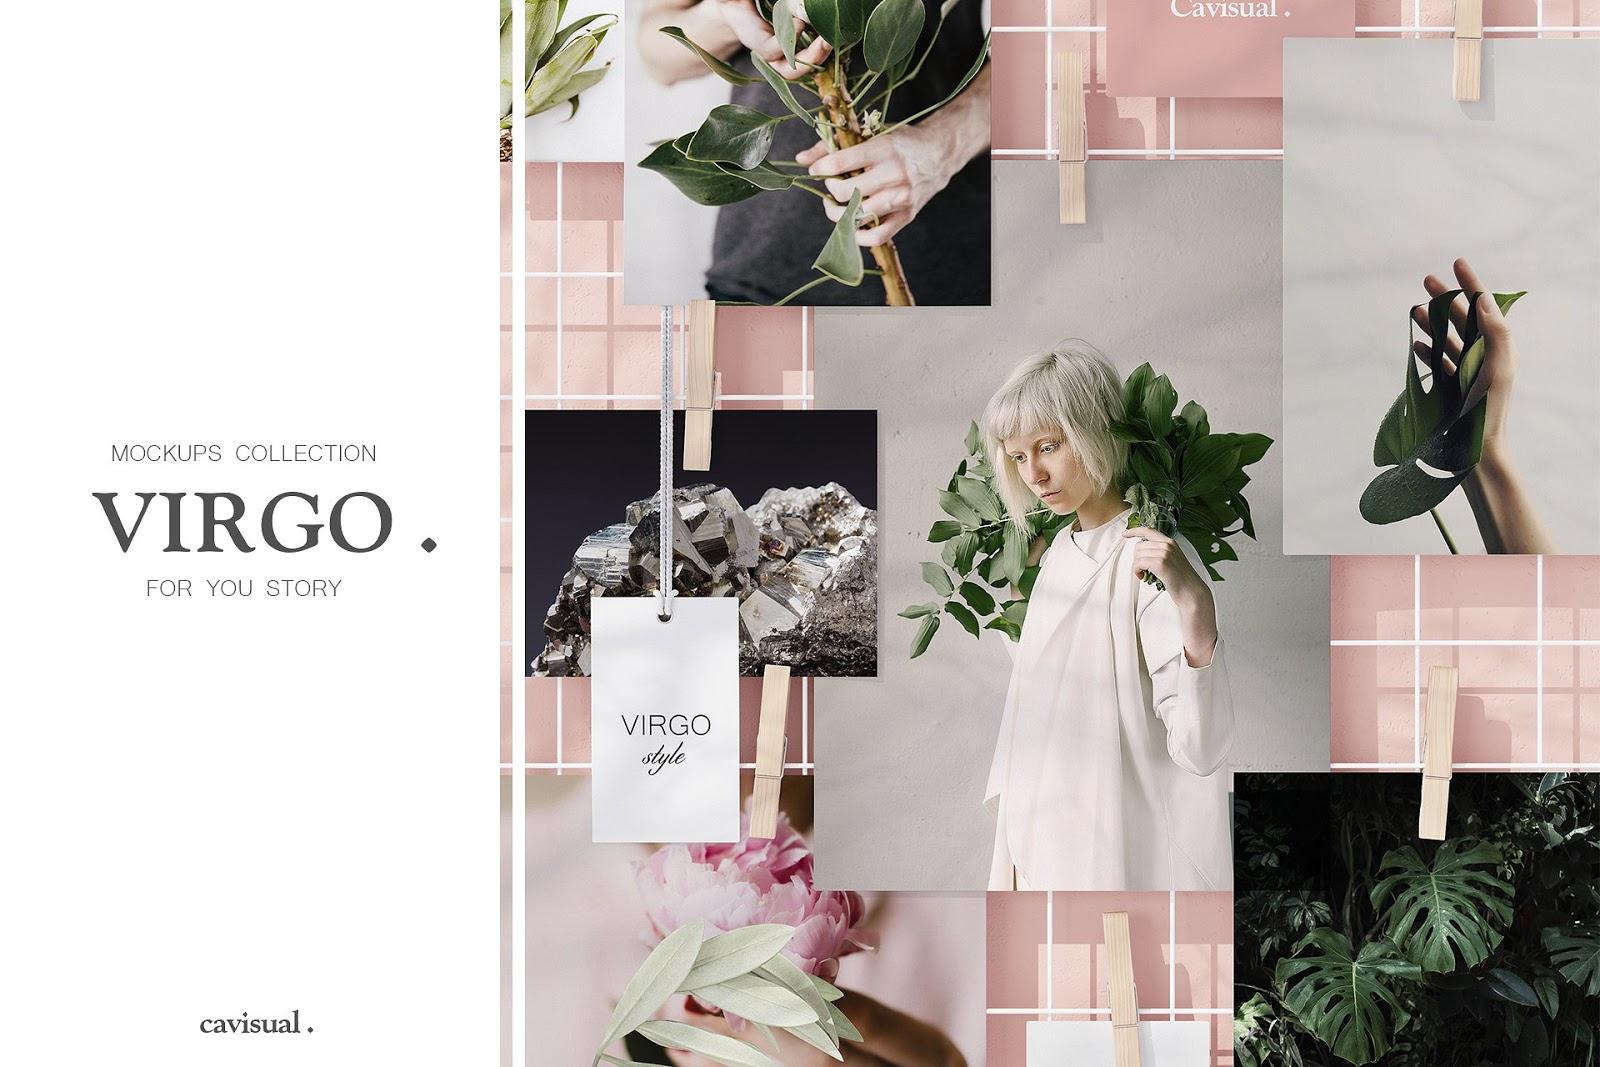 Virgo Mockups Collection